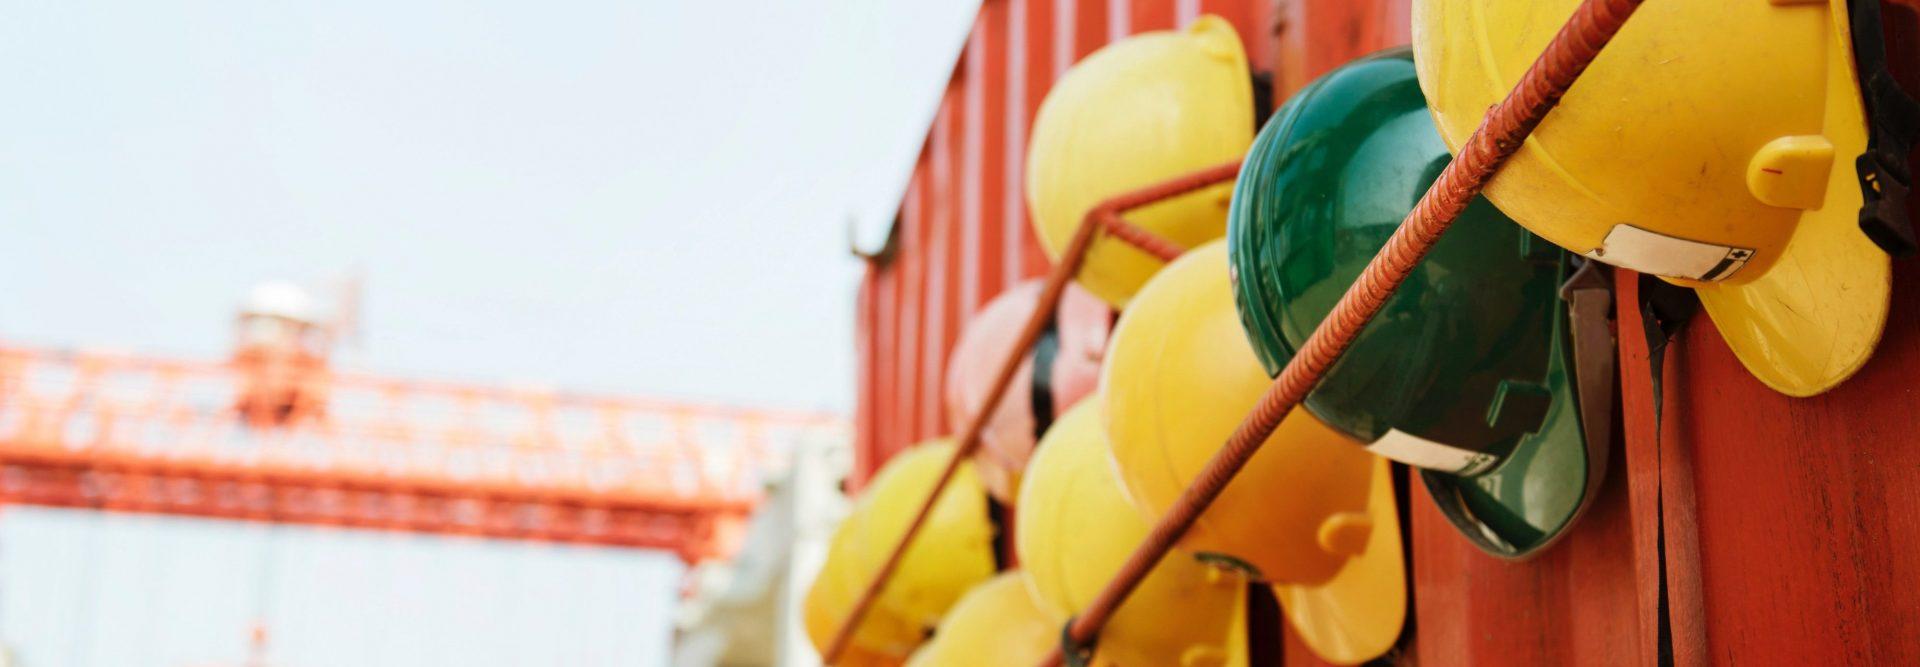 non-compliance, compliance violation, compliance training, compliance program